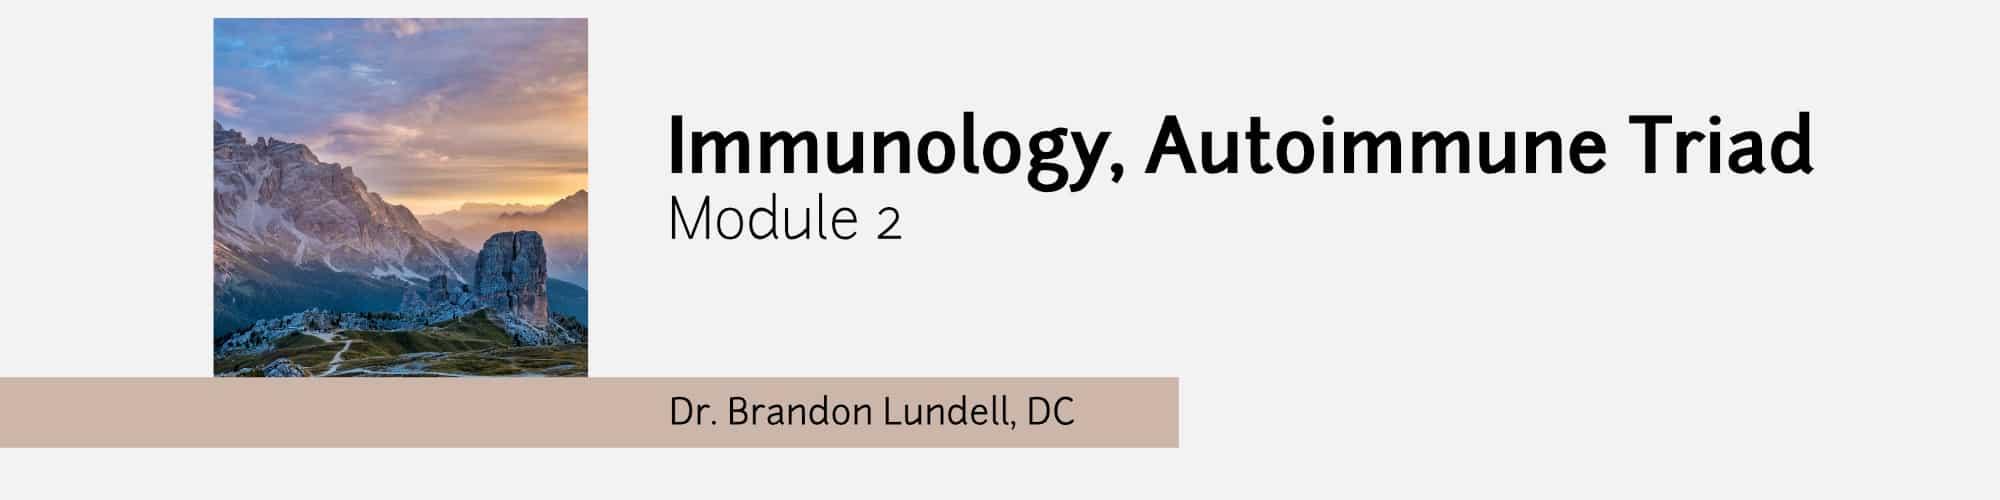 Module 2 - Immunology, Autoimmune Triad